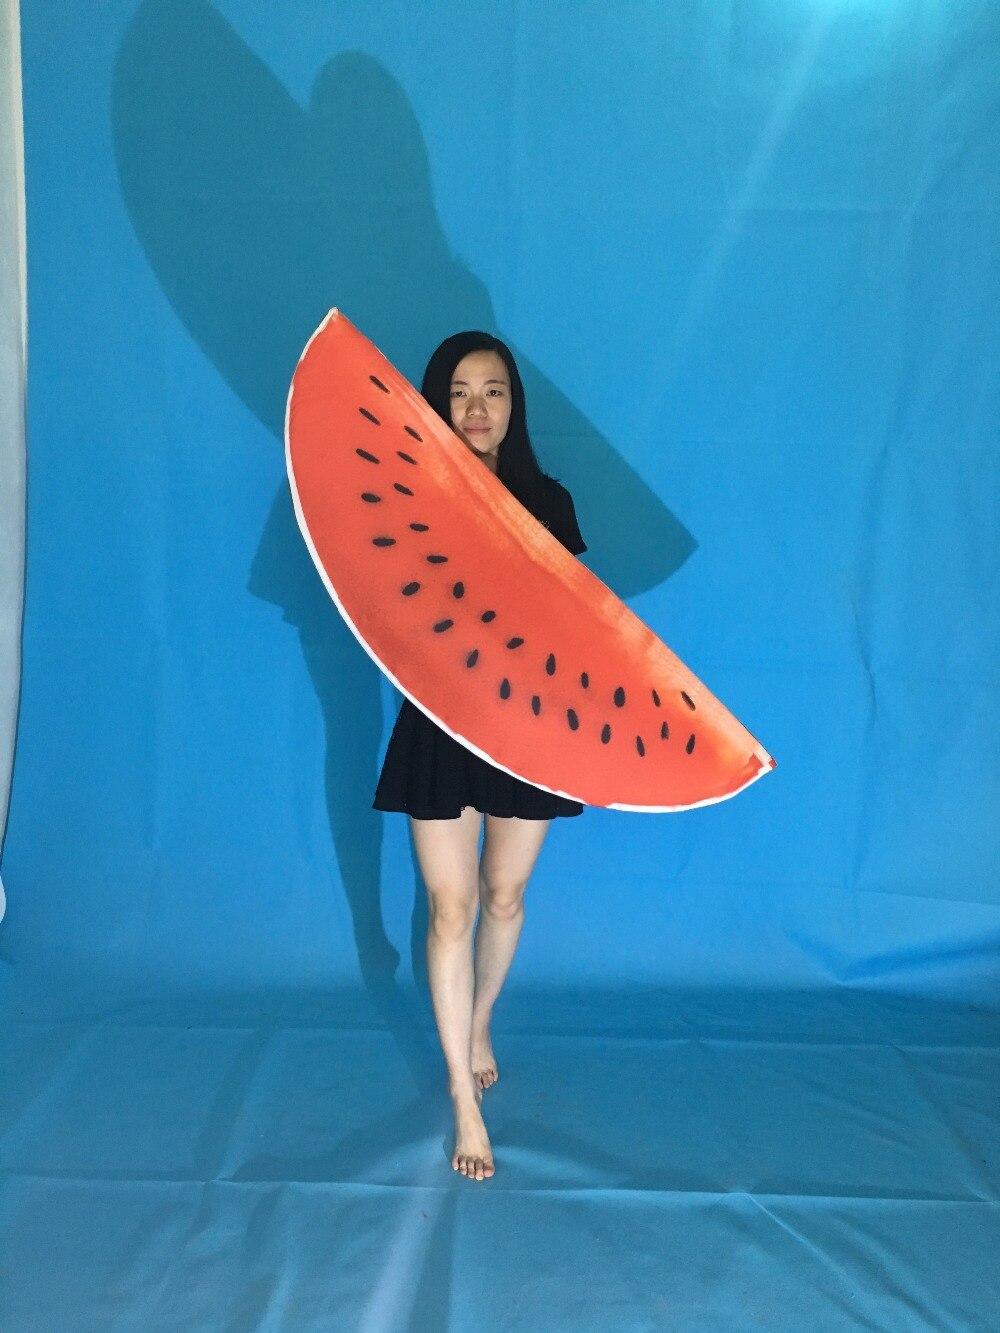 Hot Sale Professional Mascot Costume Adult Size Banana grape watermelon pineapple apple fruit Mascot Costume Halloween Christmas - 3